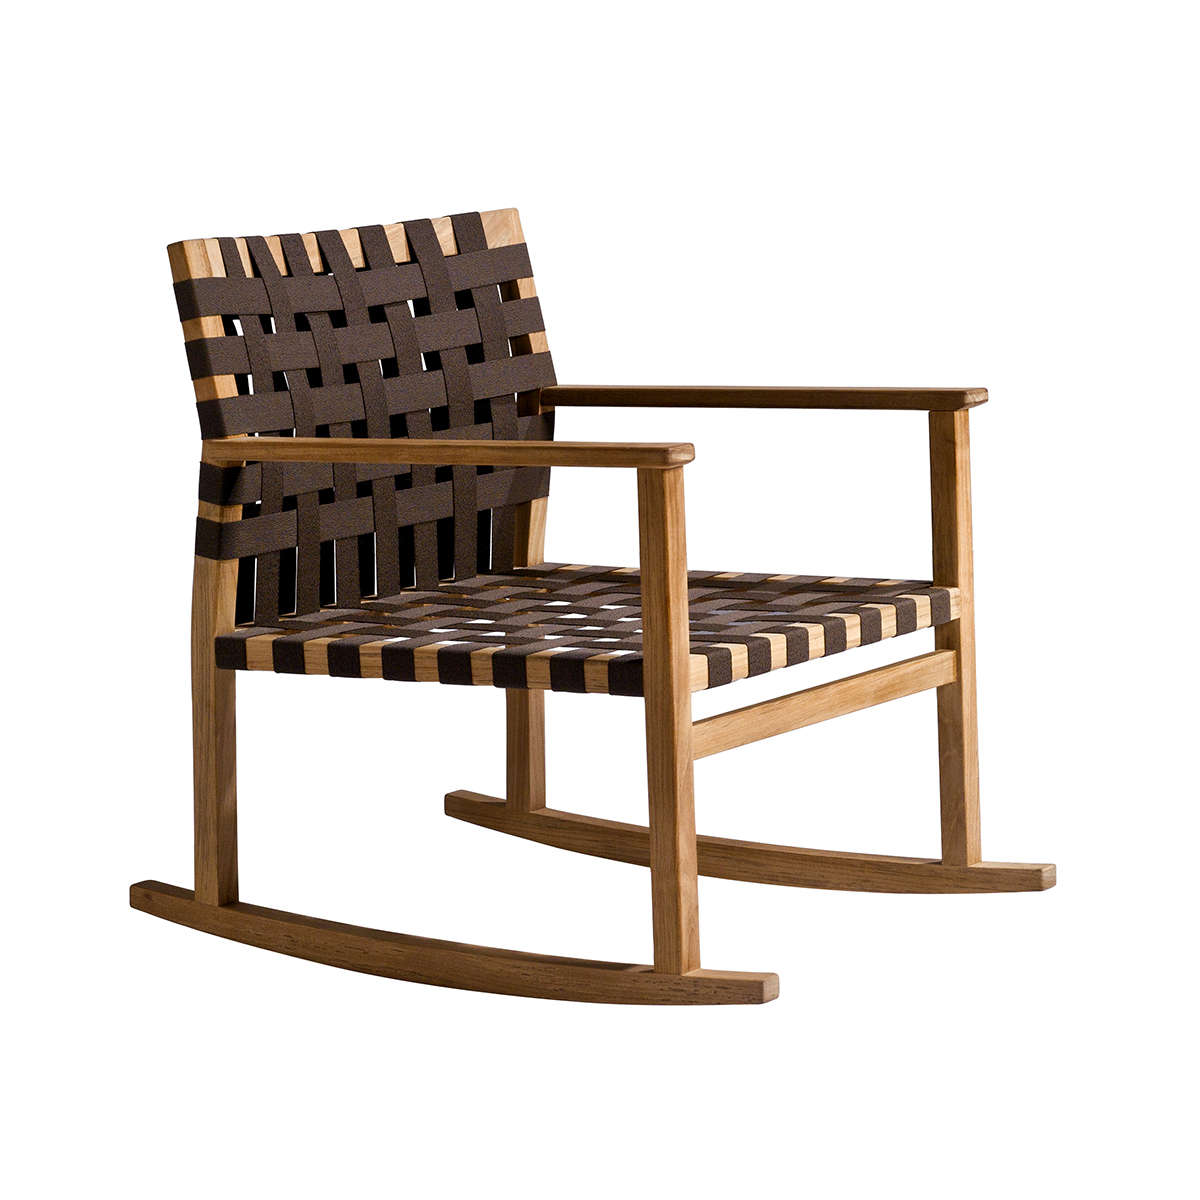 Vis a Vis Rocking Chair